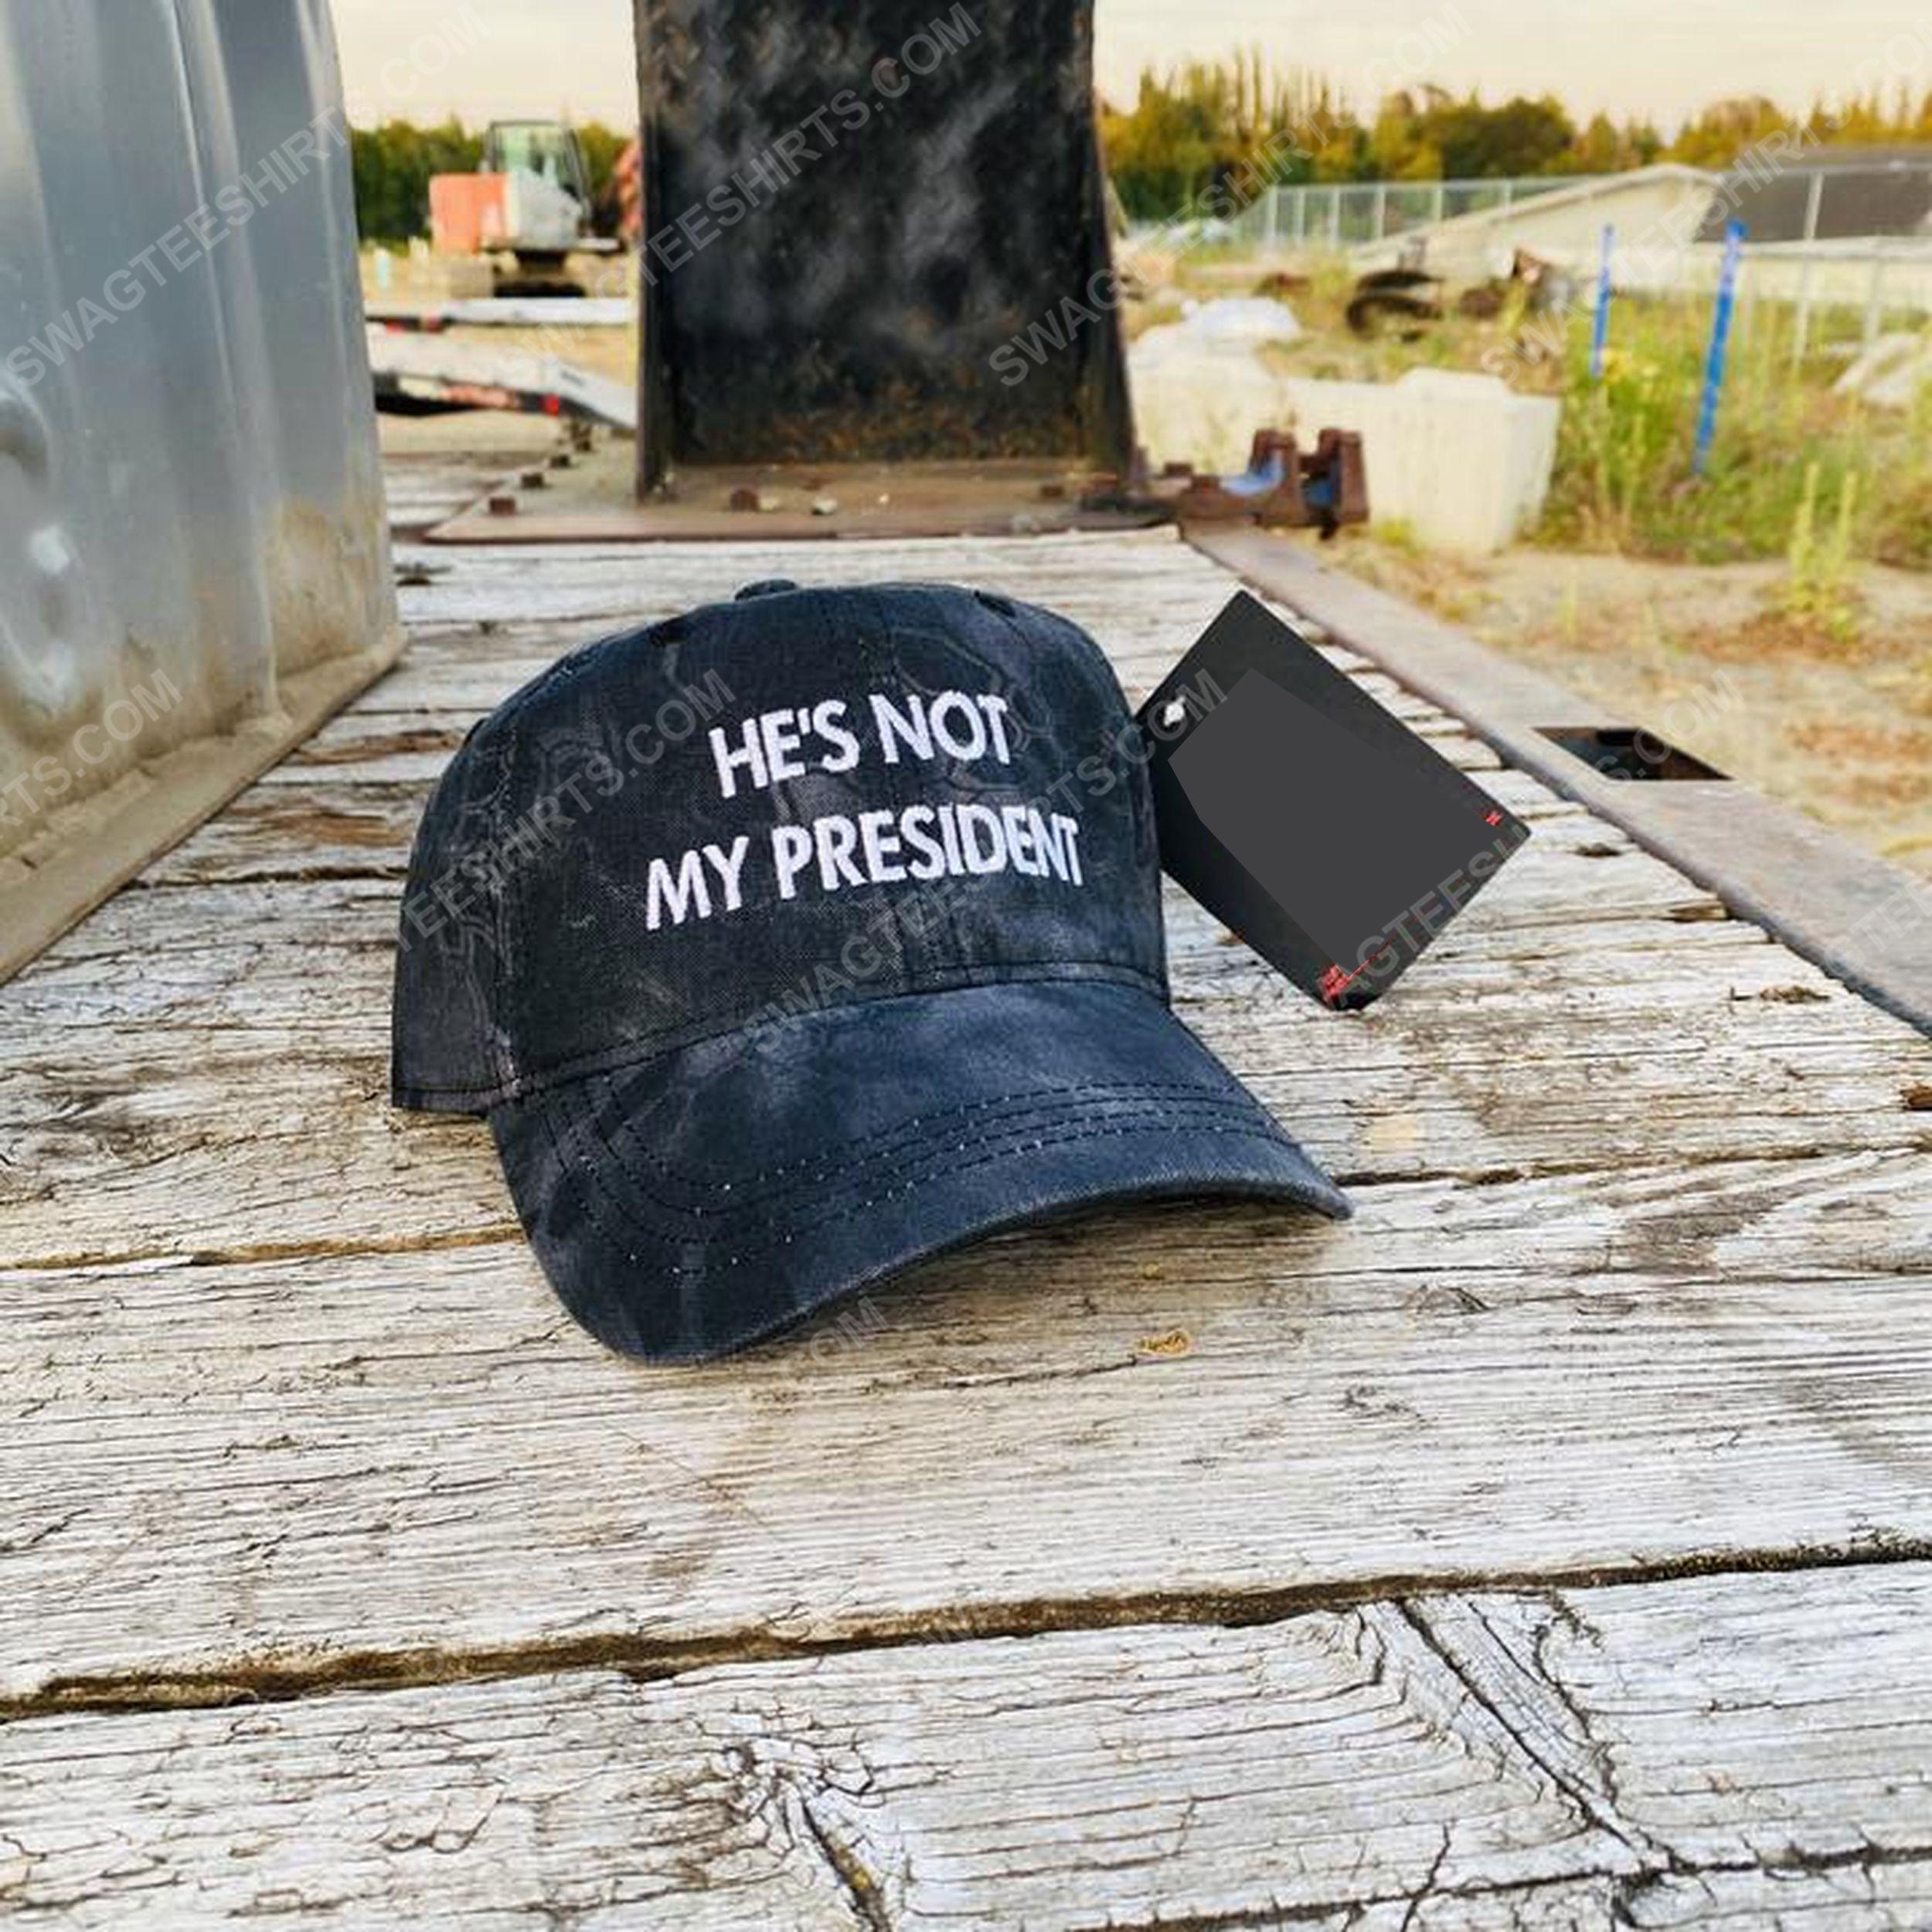 He's not my president full print classic hat 1 - Copy (3)